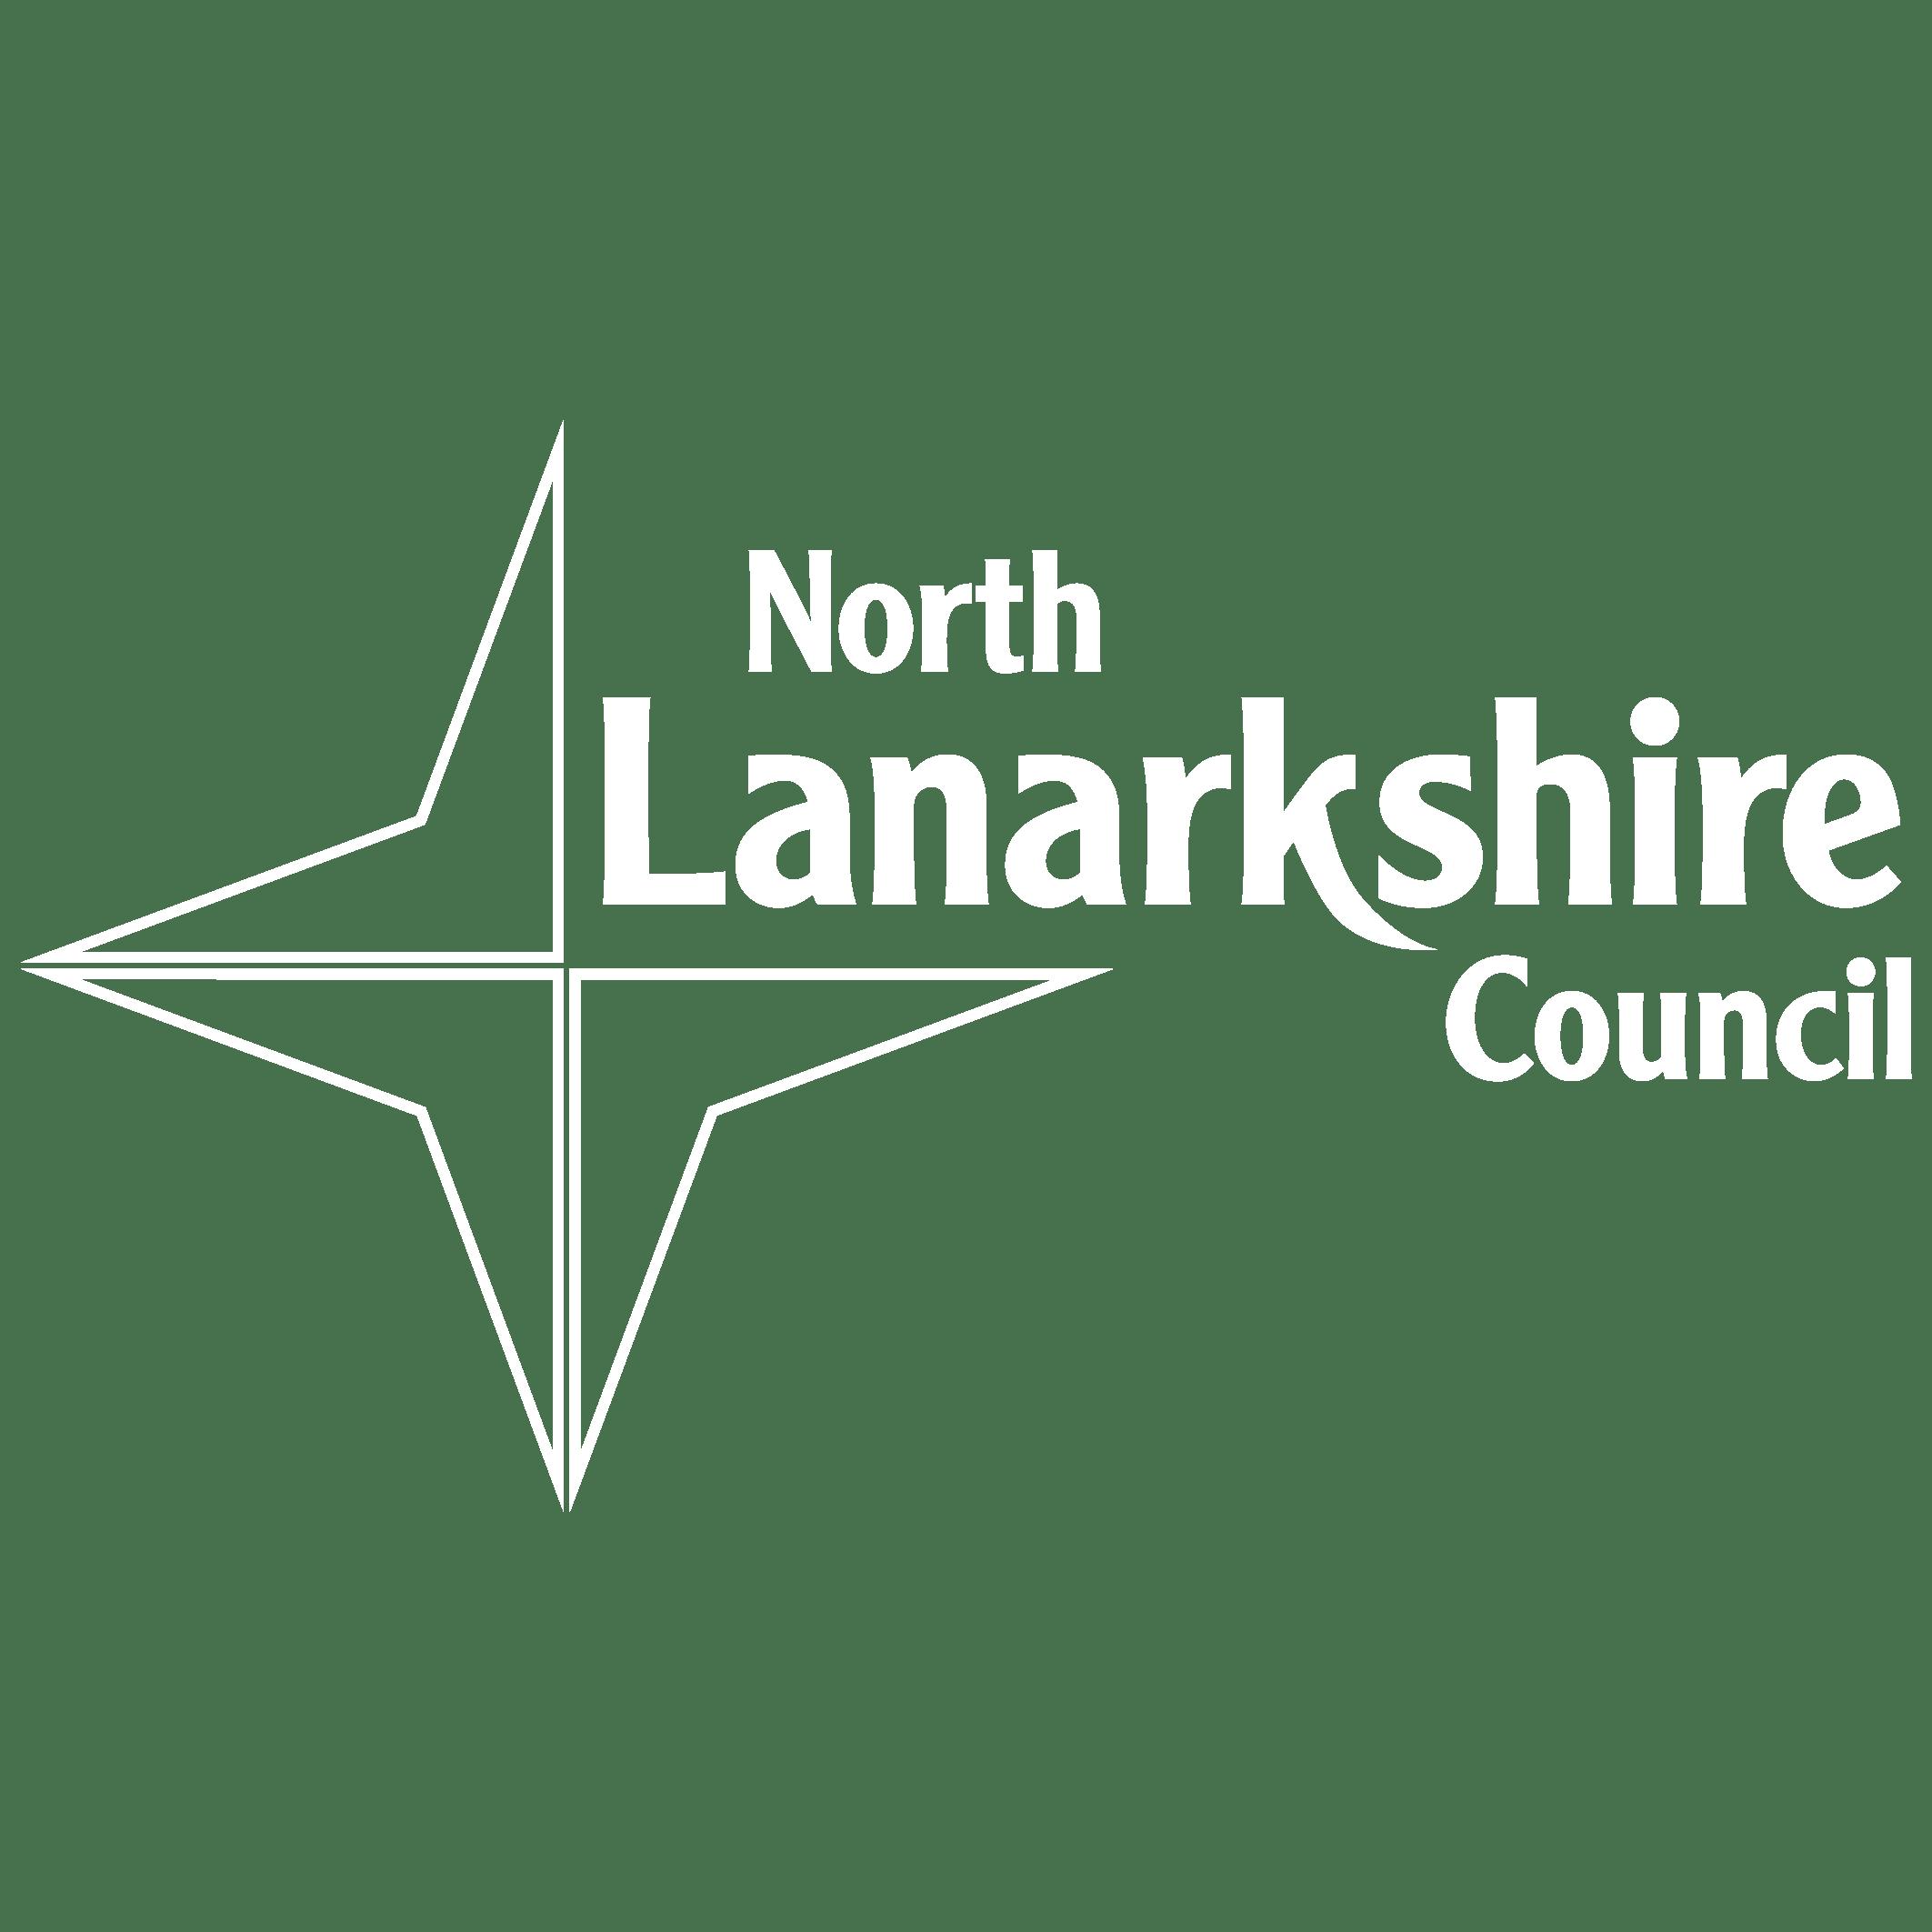 north-lanarkshire-council-logo